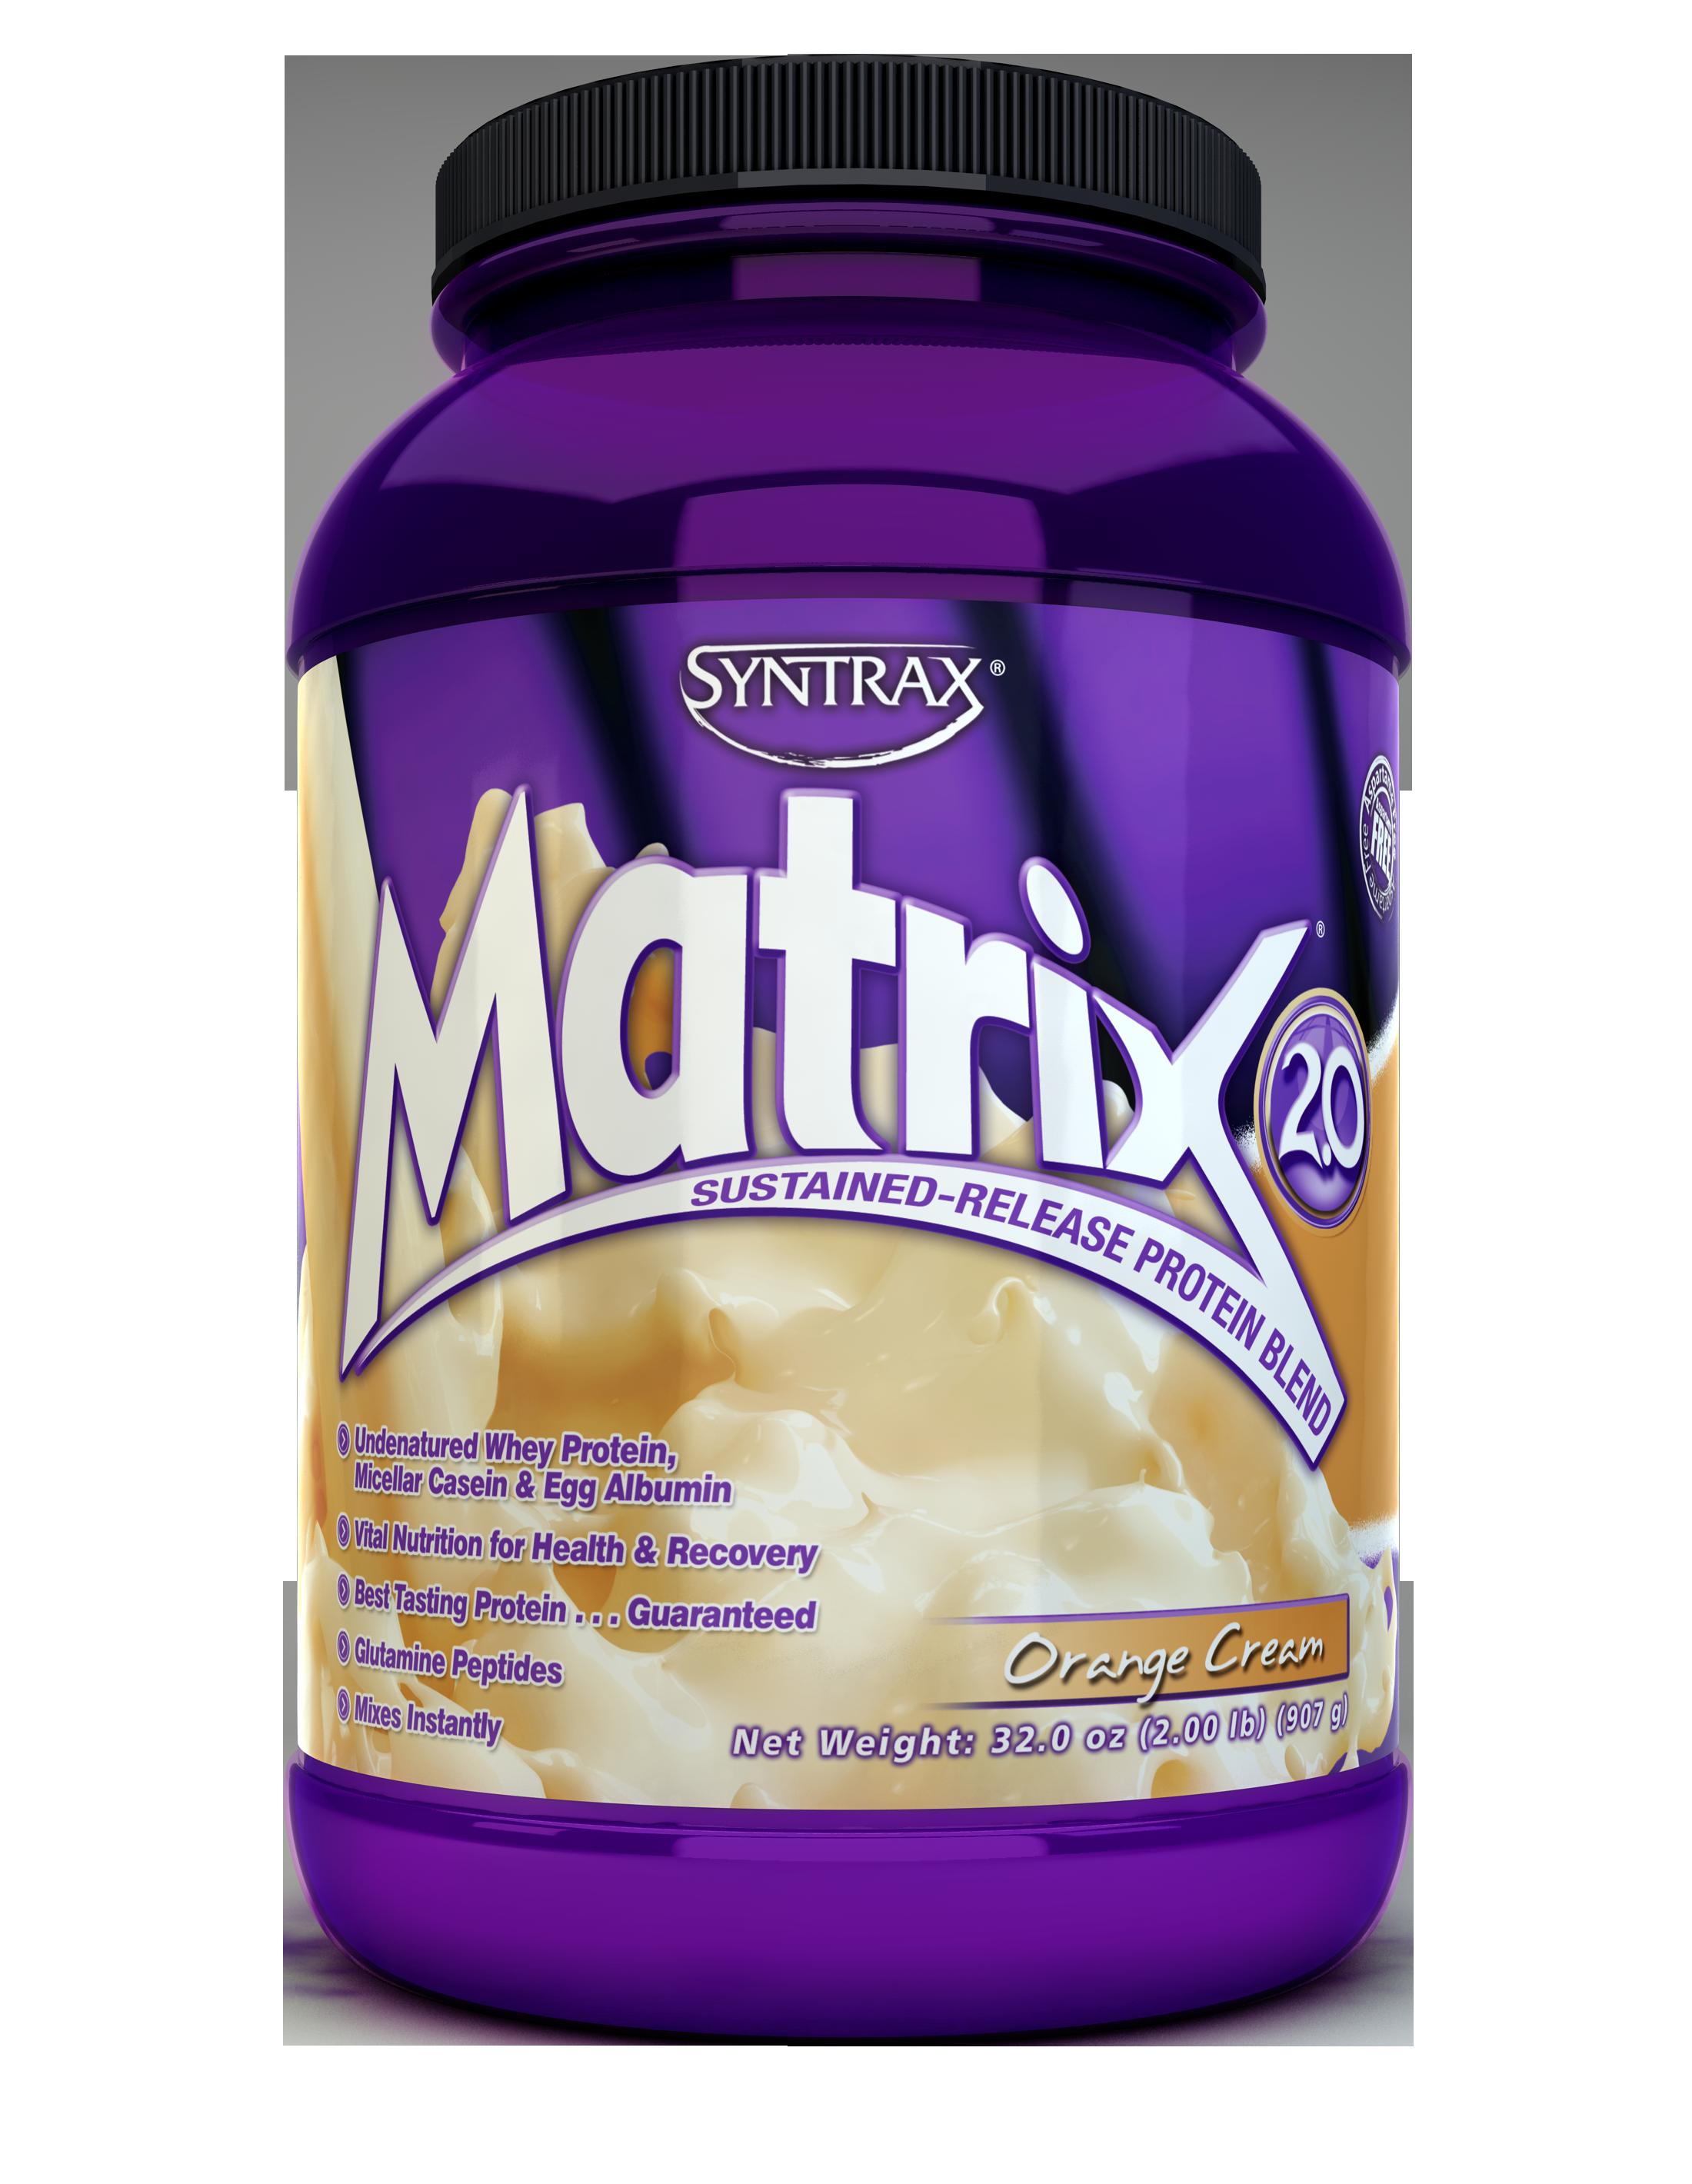 Syntrax Matrix 2.0 - Orange Cream 2 lb